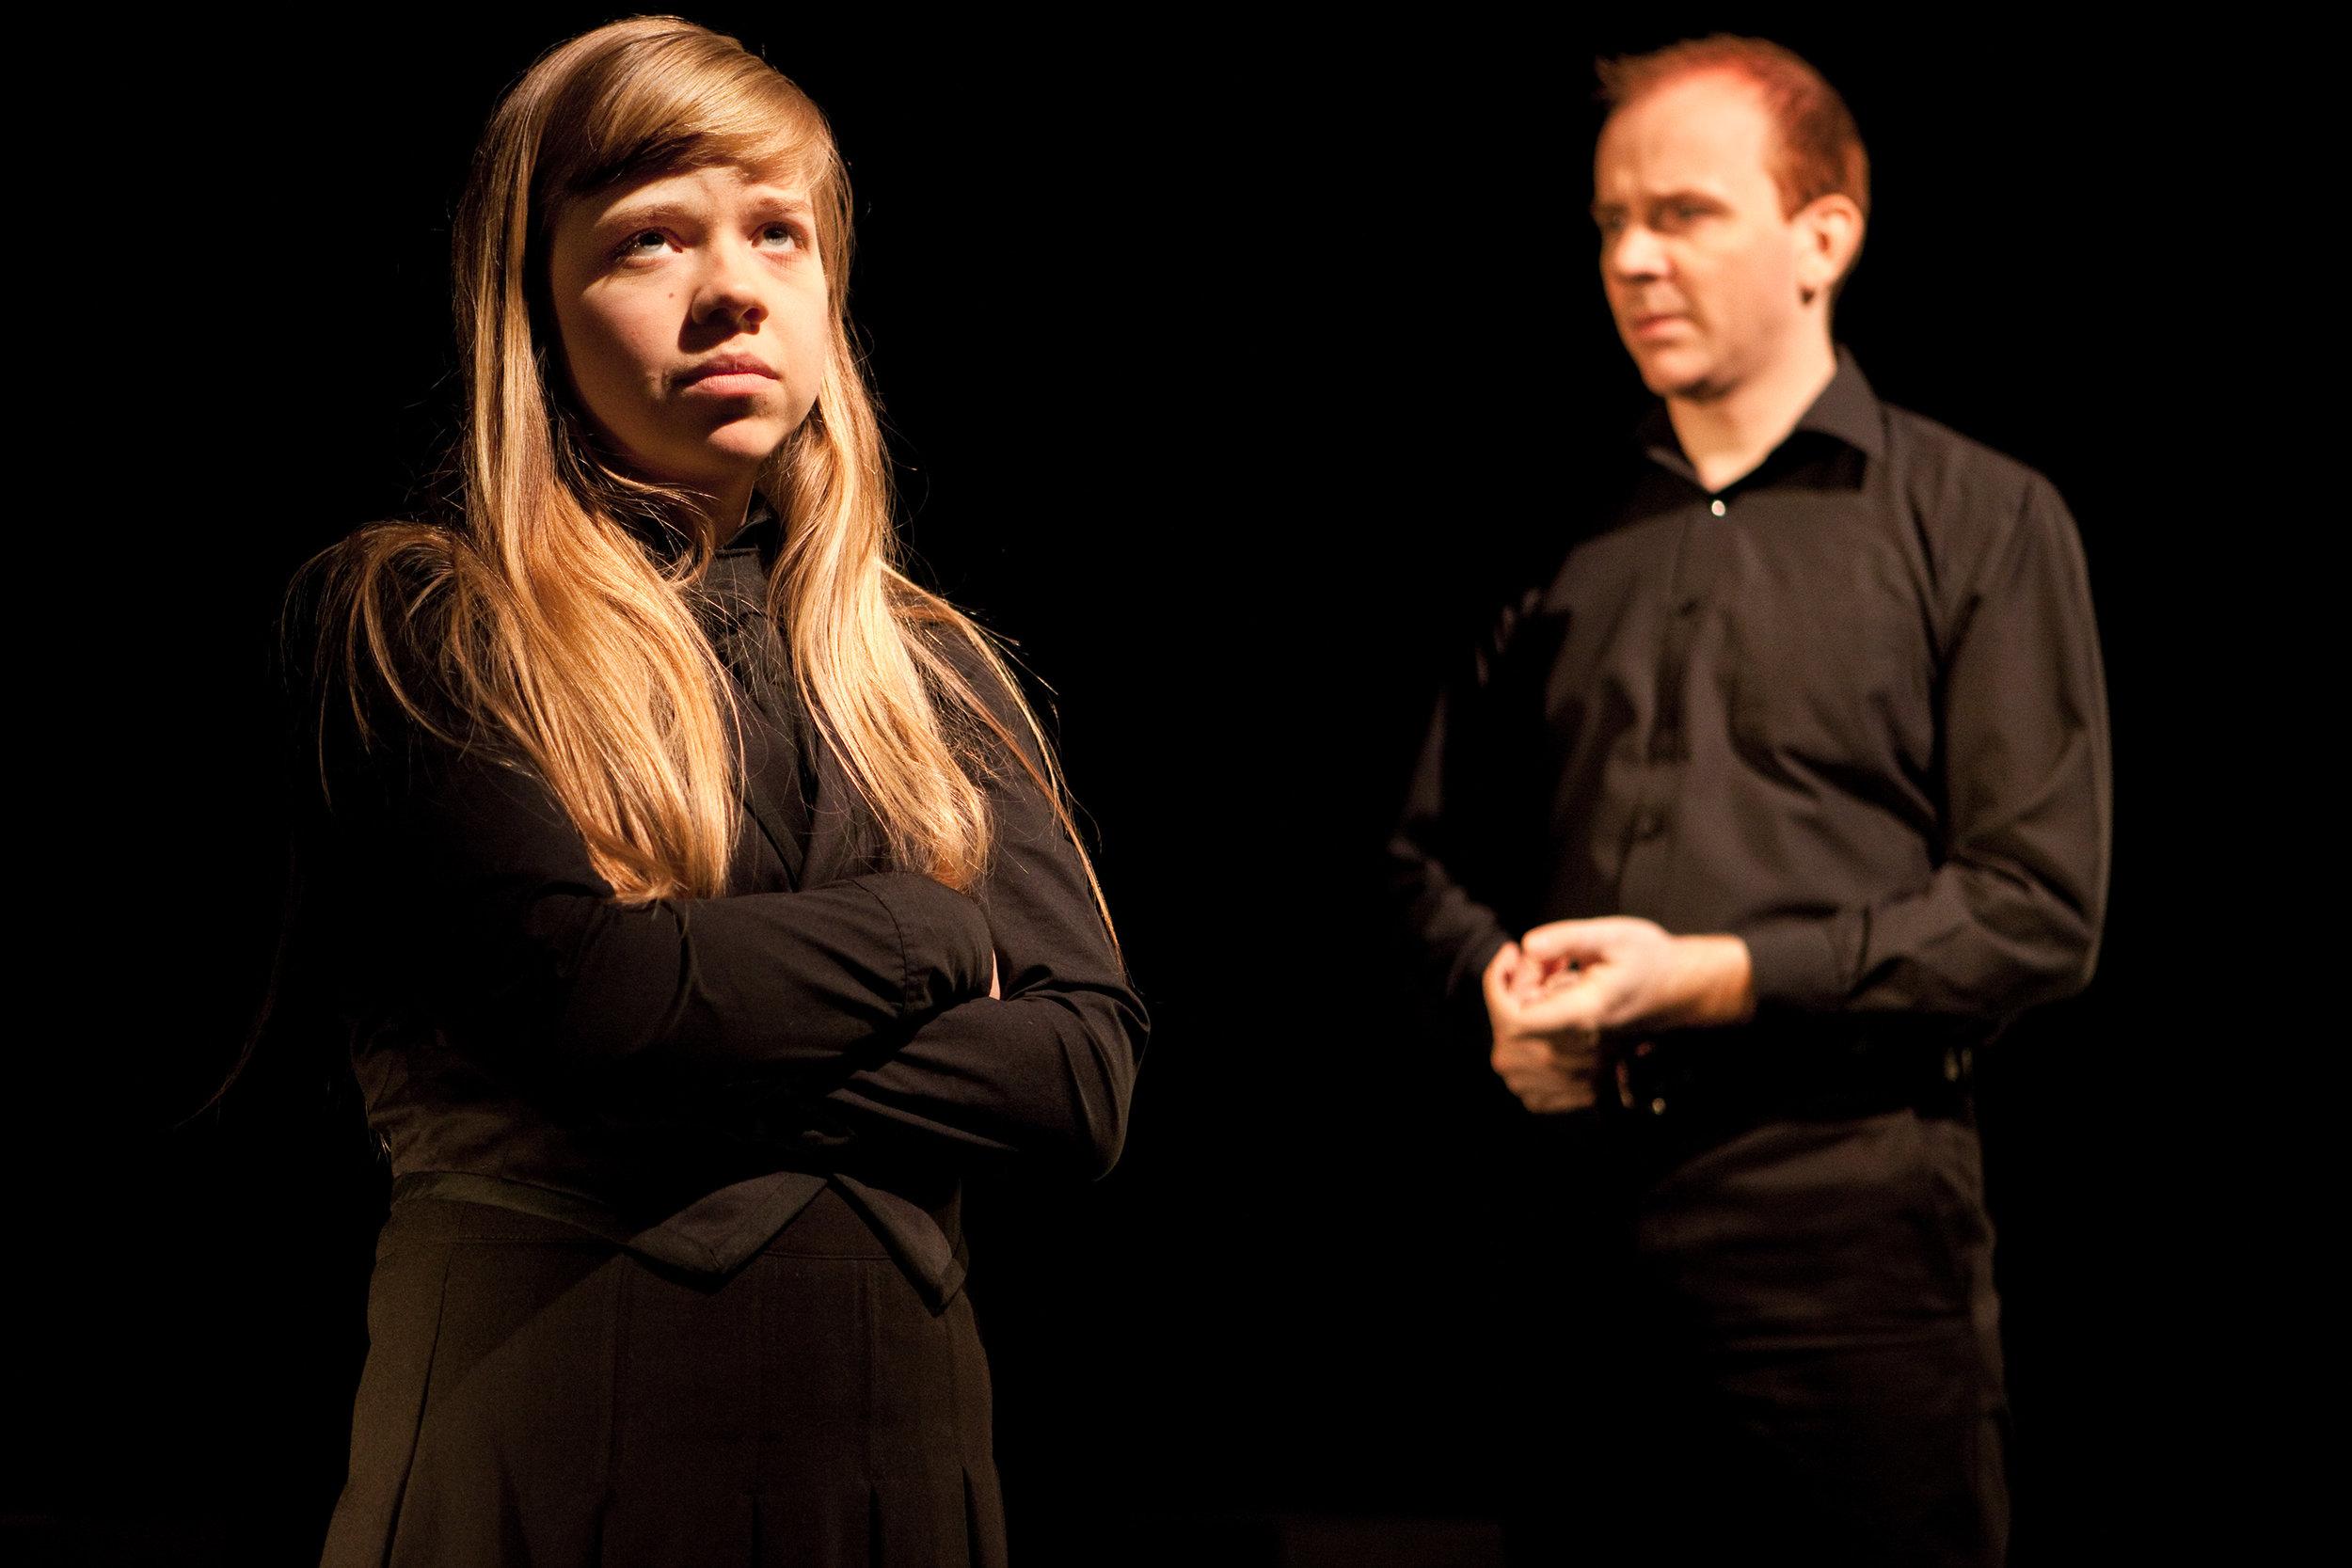 Vivien Endicott-Douglas in Tarragon Theatre's Premiere Production directed by Richard Rose. Photo Credit: Cylla Von Tiedemann